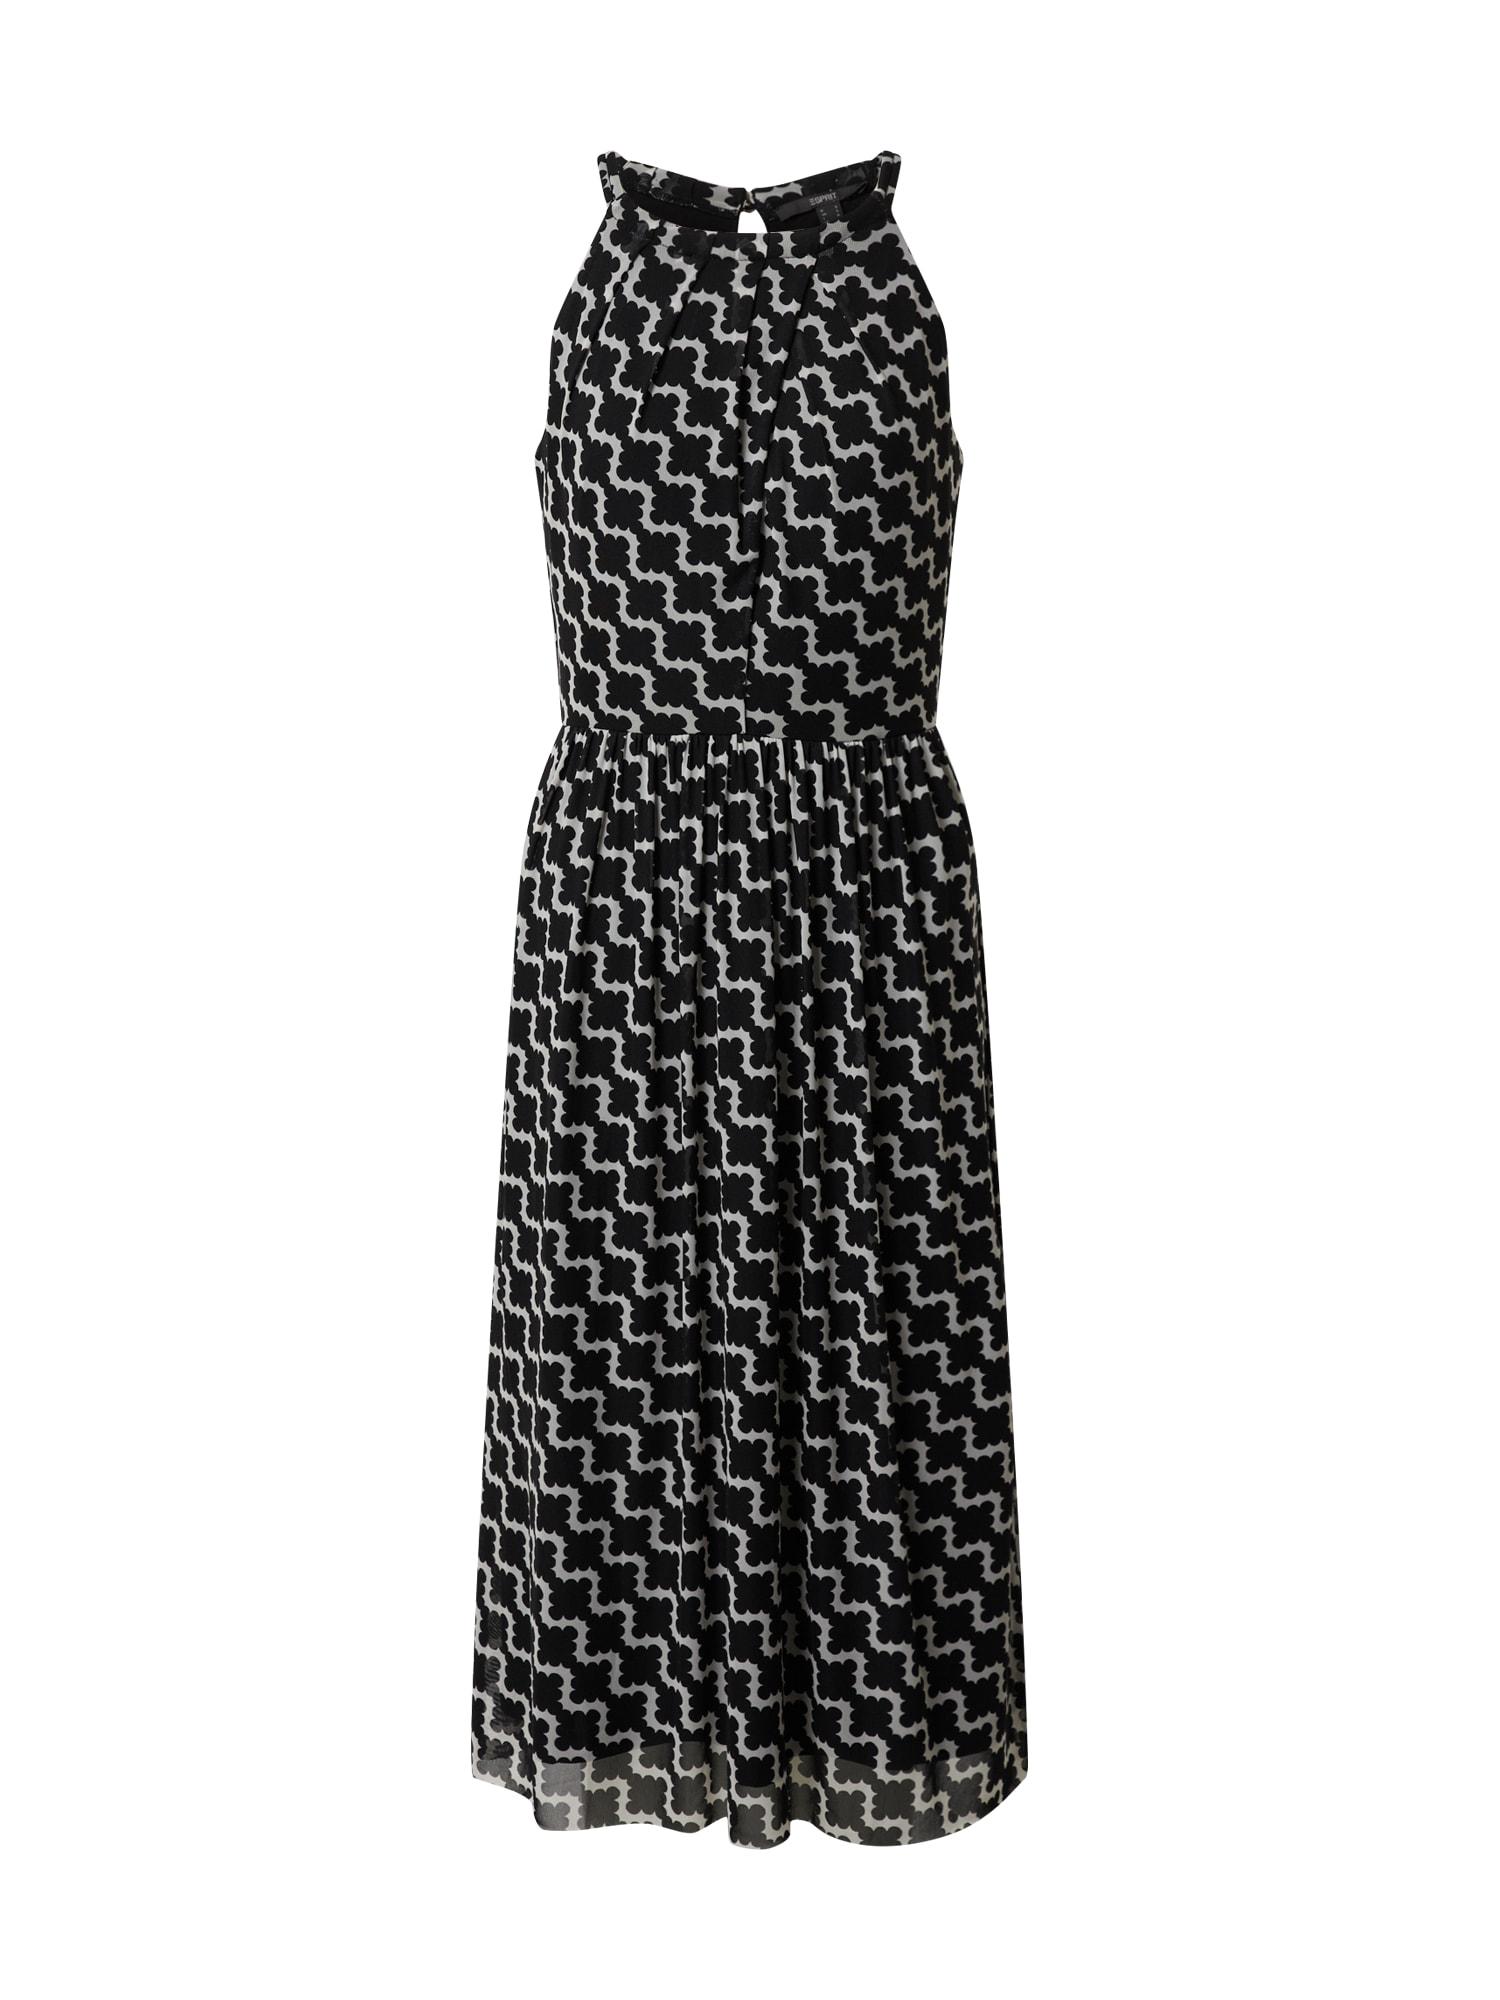 Esprit Collection Suknelė balkšva / juoda